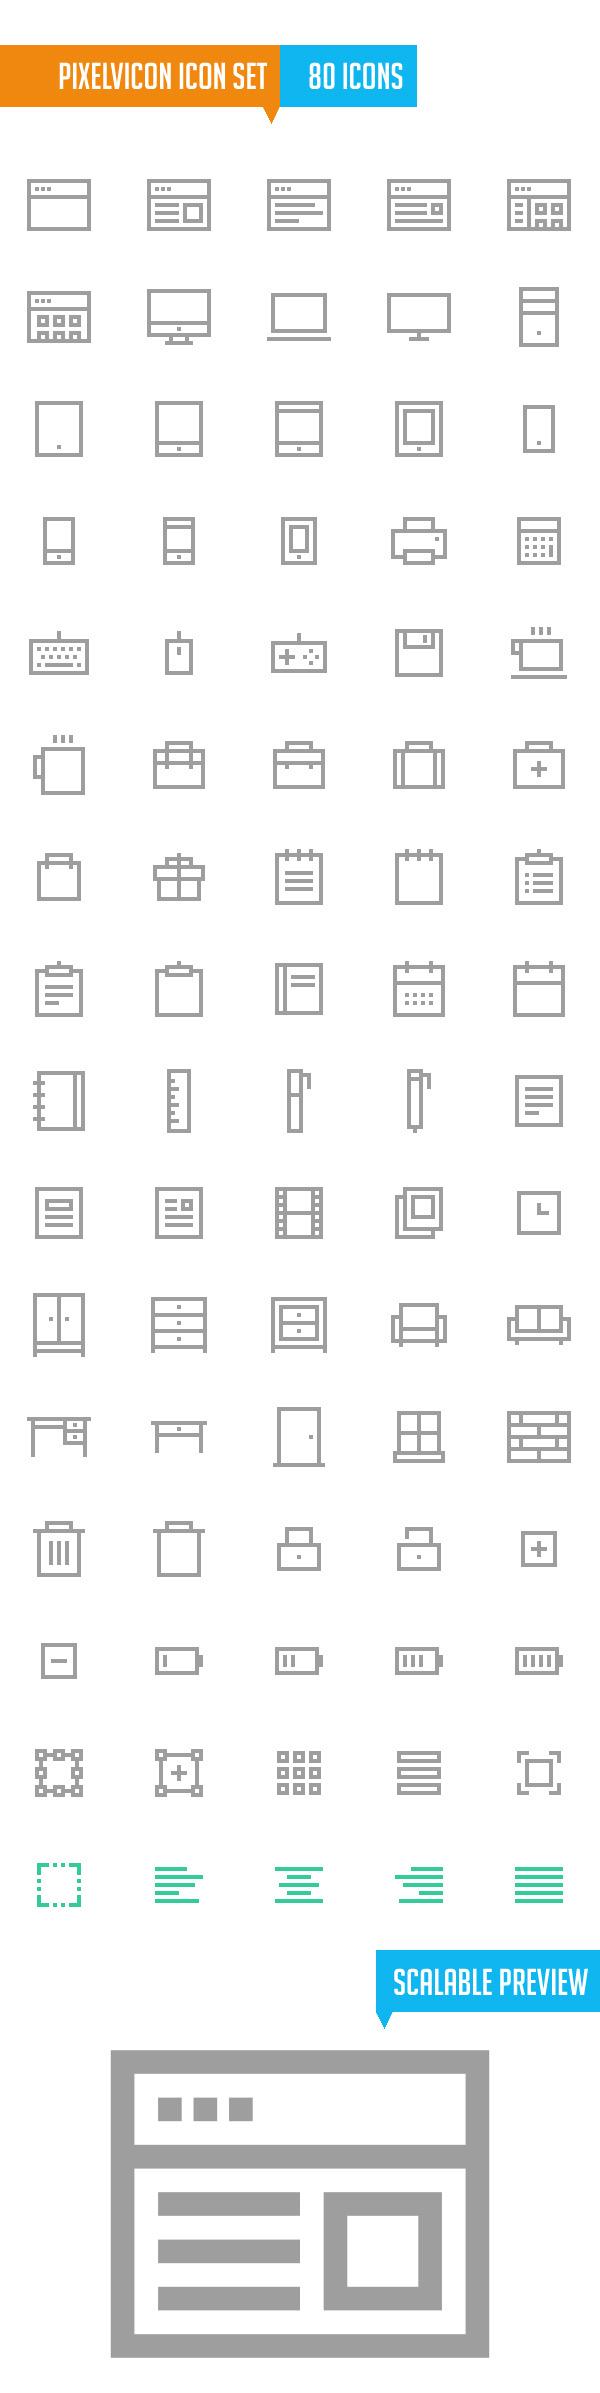 Pixelvicon Icon Set (80 Icons)